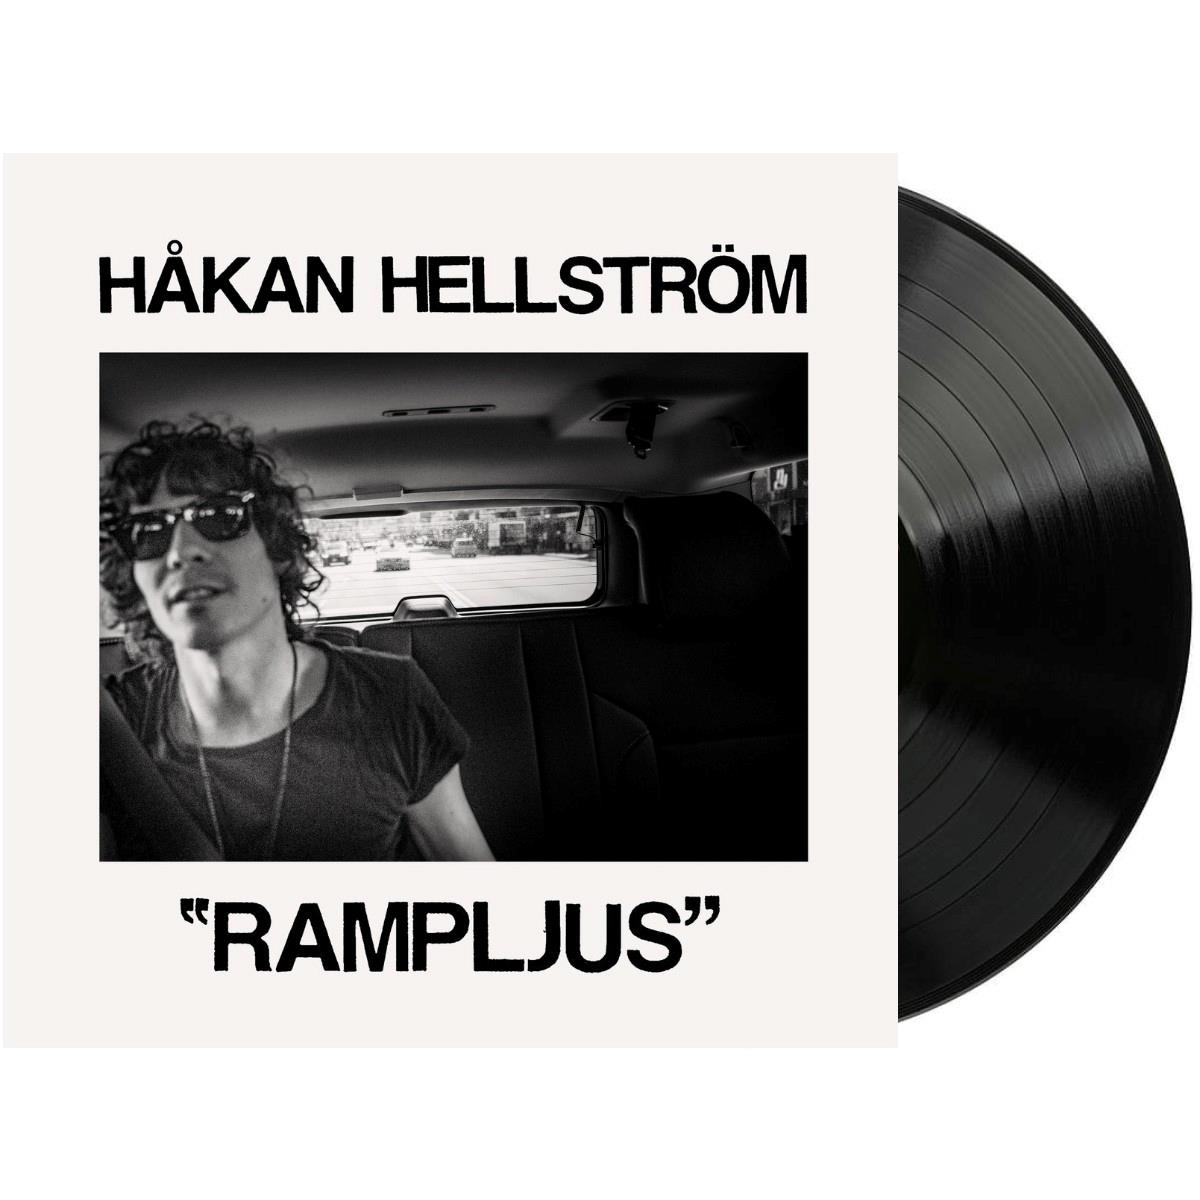 Håkan Hellström - Rampljus (vol.1) [LP]